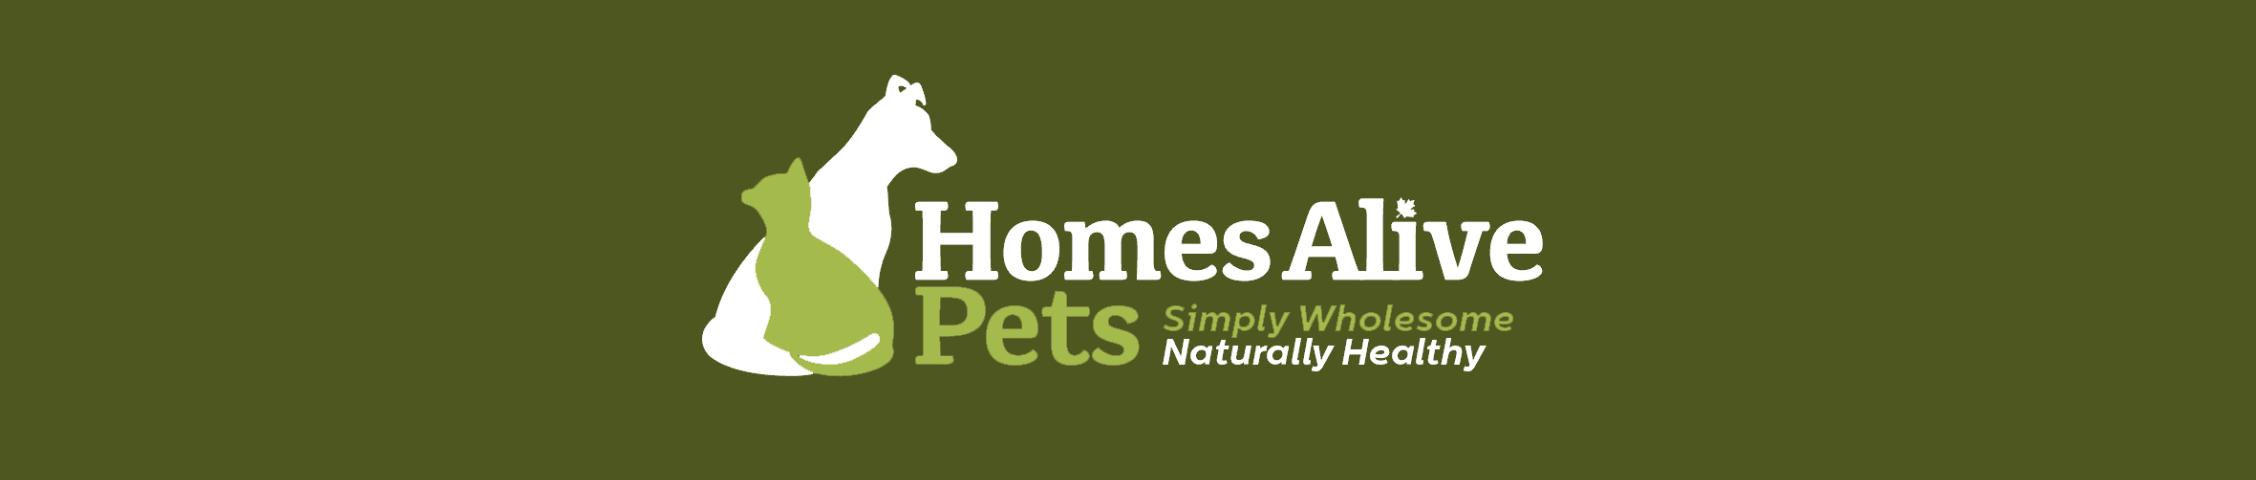 Homes Alive Pets Alberta